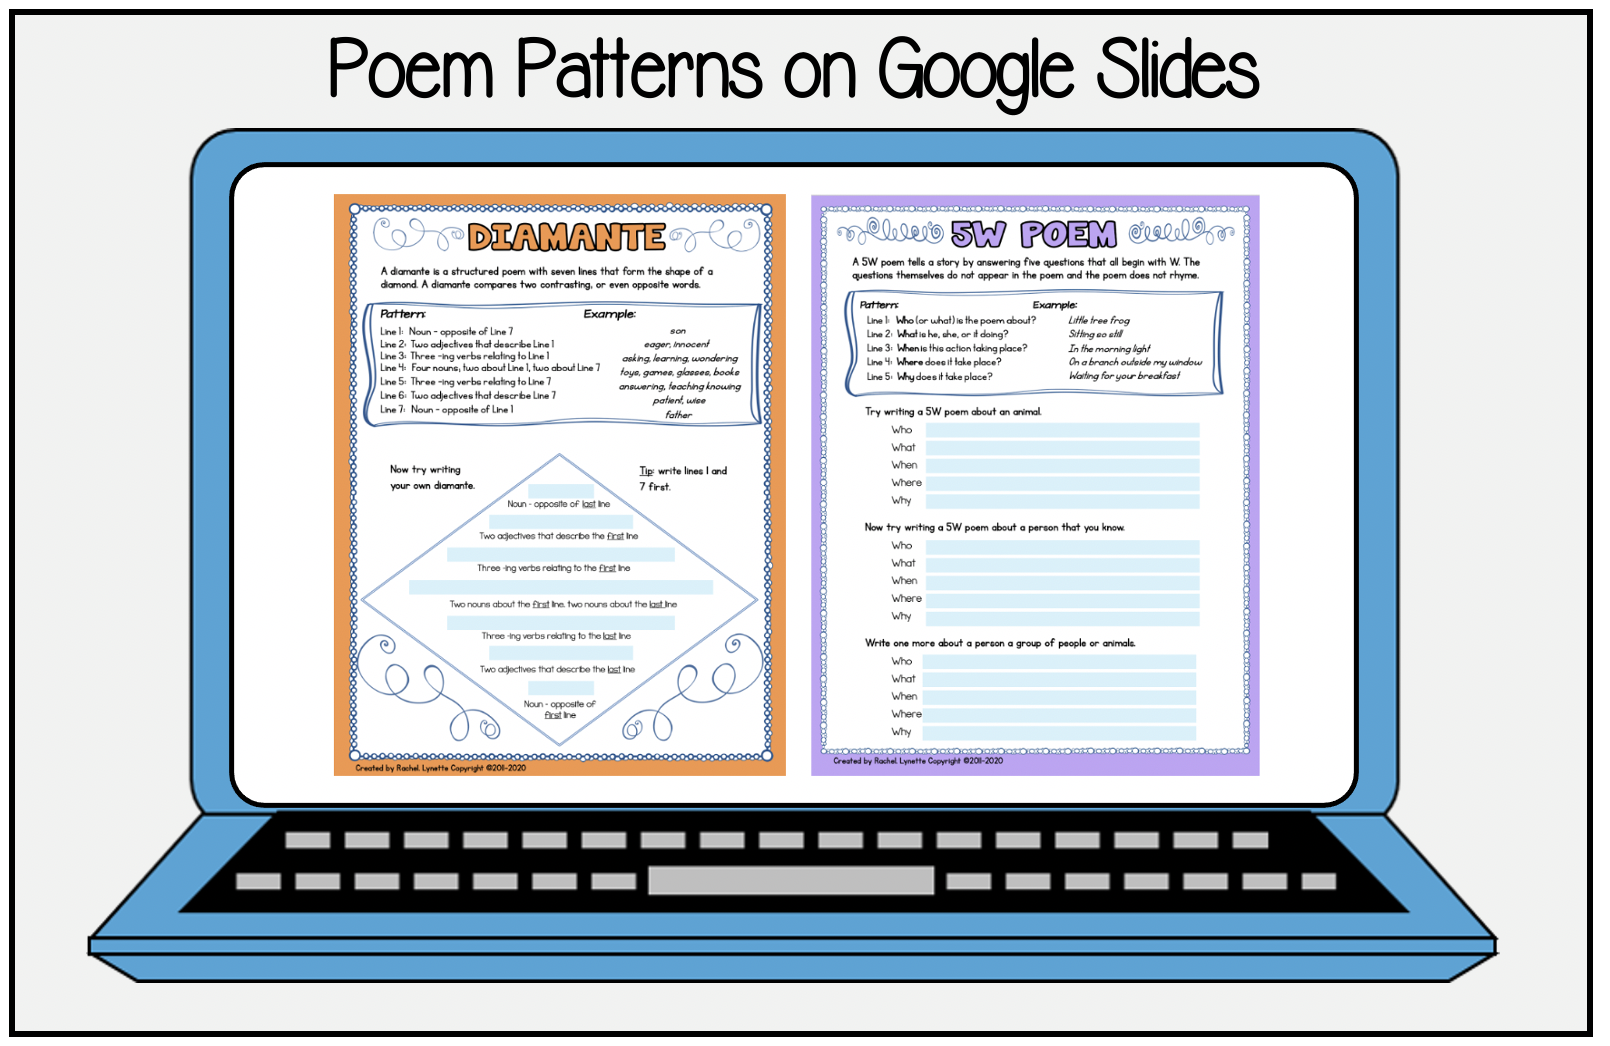 Poetry Patterns on Google Slides